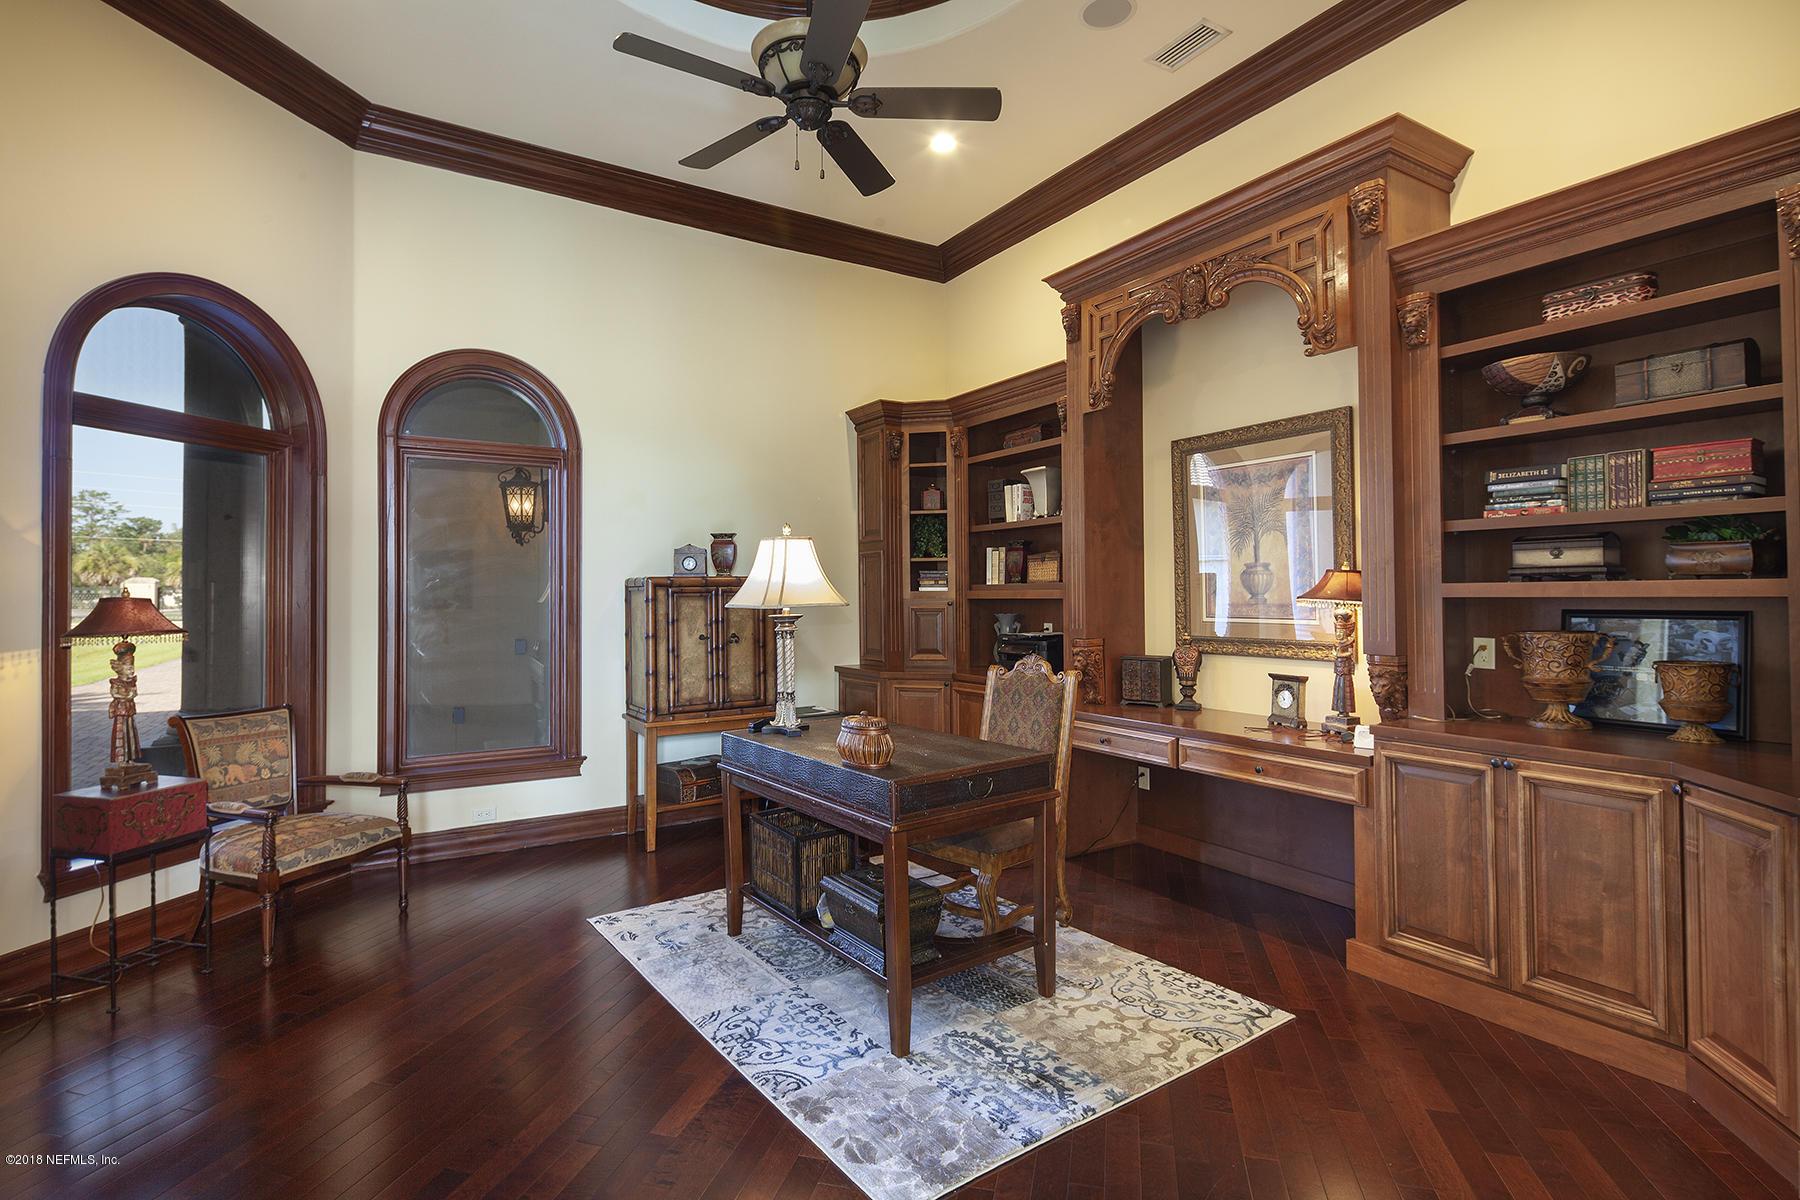 181 ROSCOE, PONTE VEDRA BEACH, FLORIDA 32082, 5 Bedrooms Bedrooms, ,7 BathroomsBathrooms,Residential - single family,For sale,ROSCOE,918986